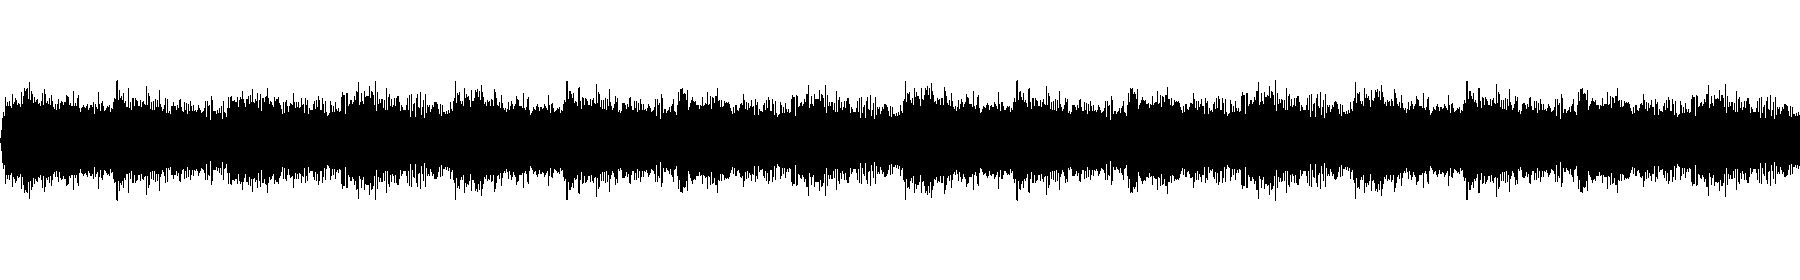 7 lit dwarfs chords   ebmin   112bpm